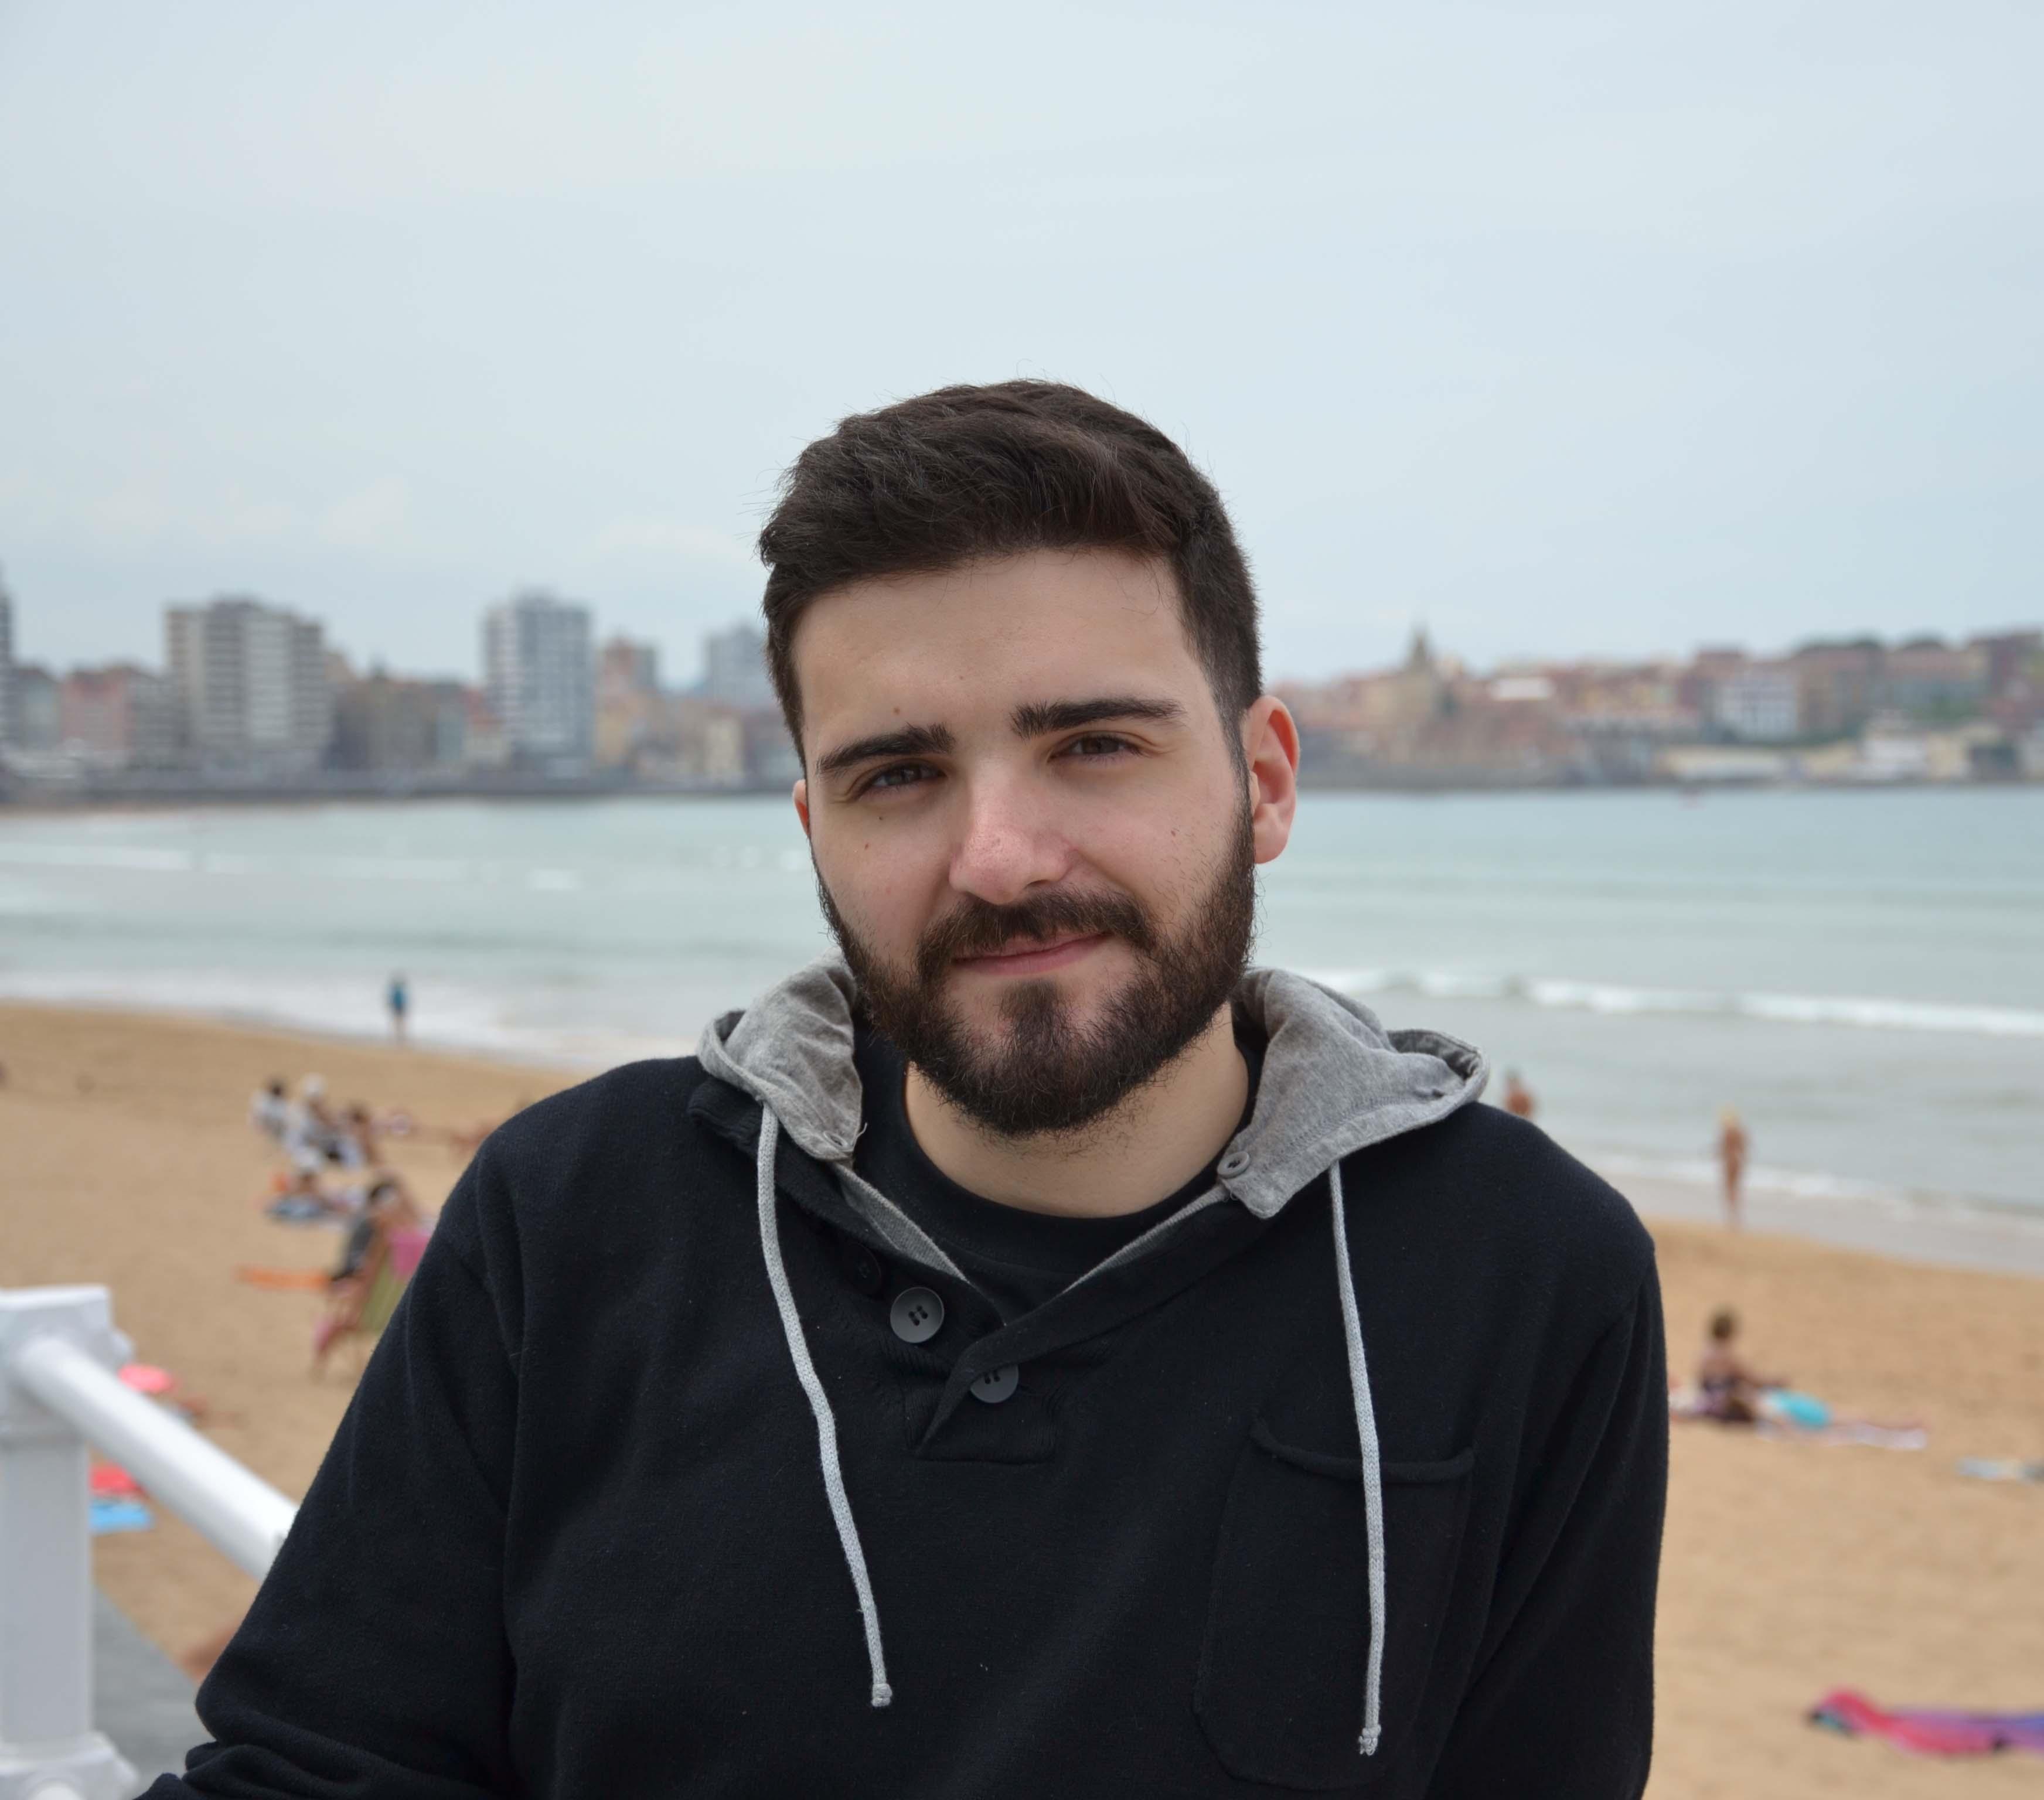 Mr Bernardo   Garcia-Pola